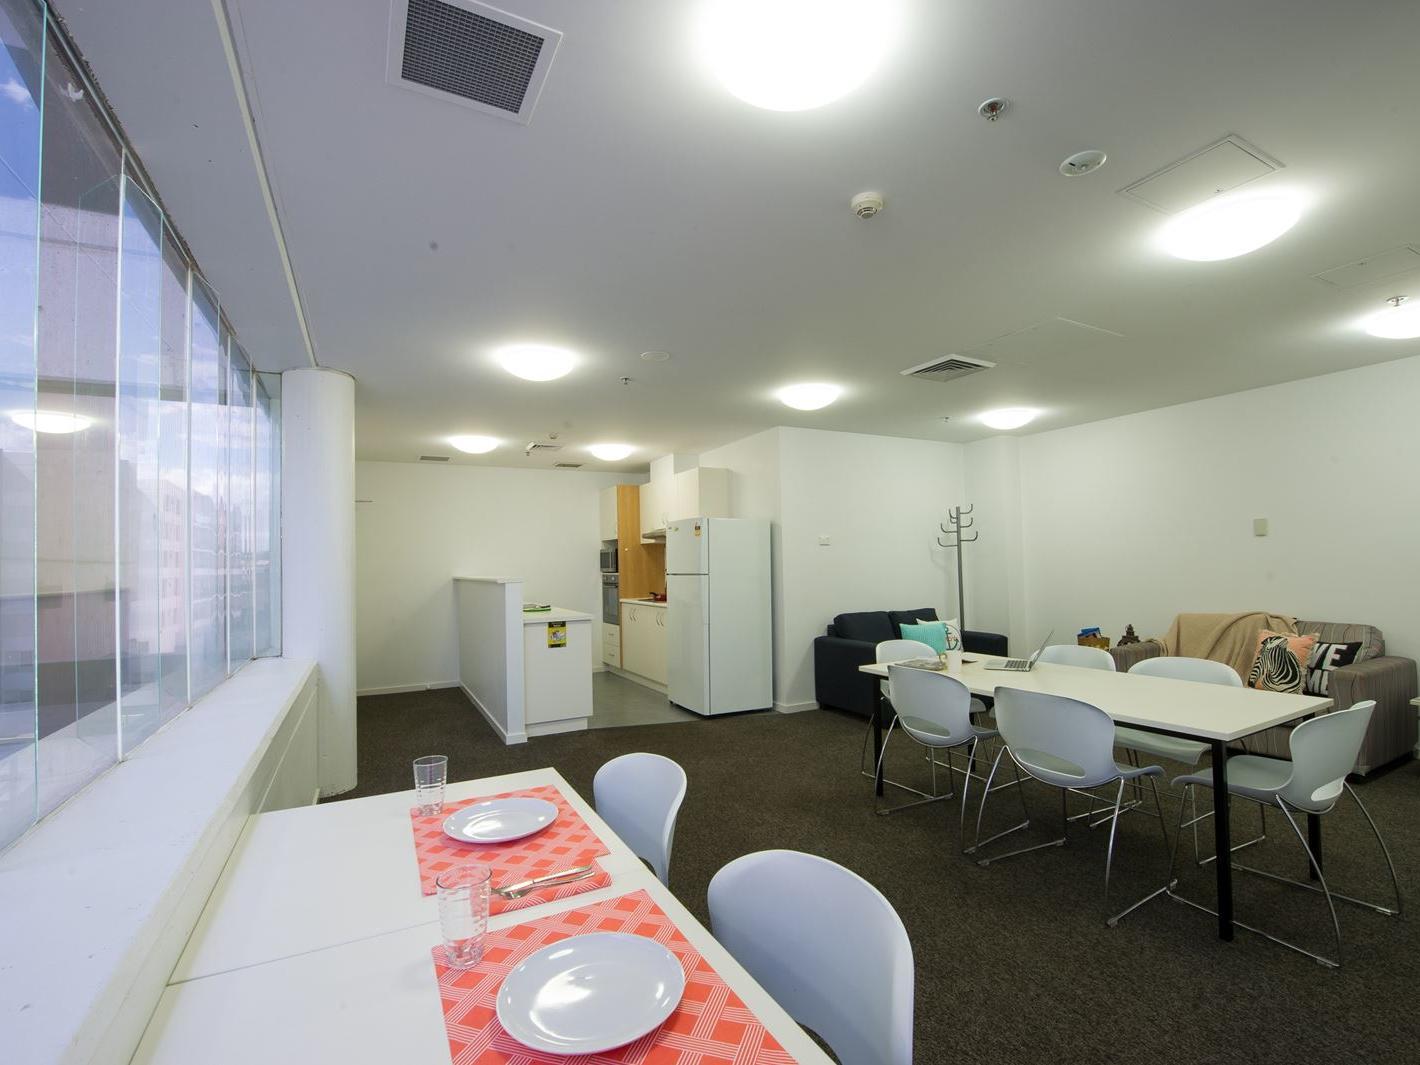 3 & 4 Bedroom Multi-share Apartment